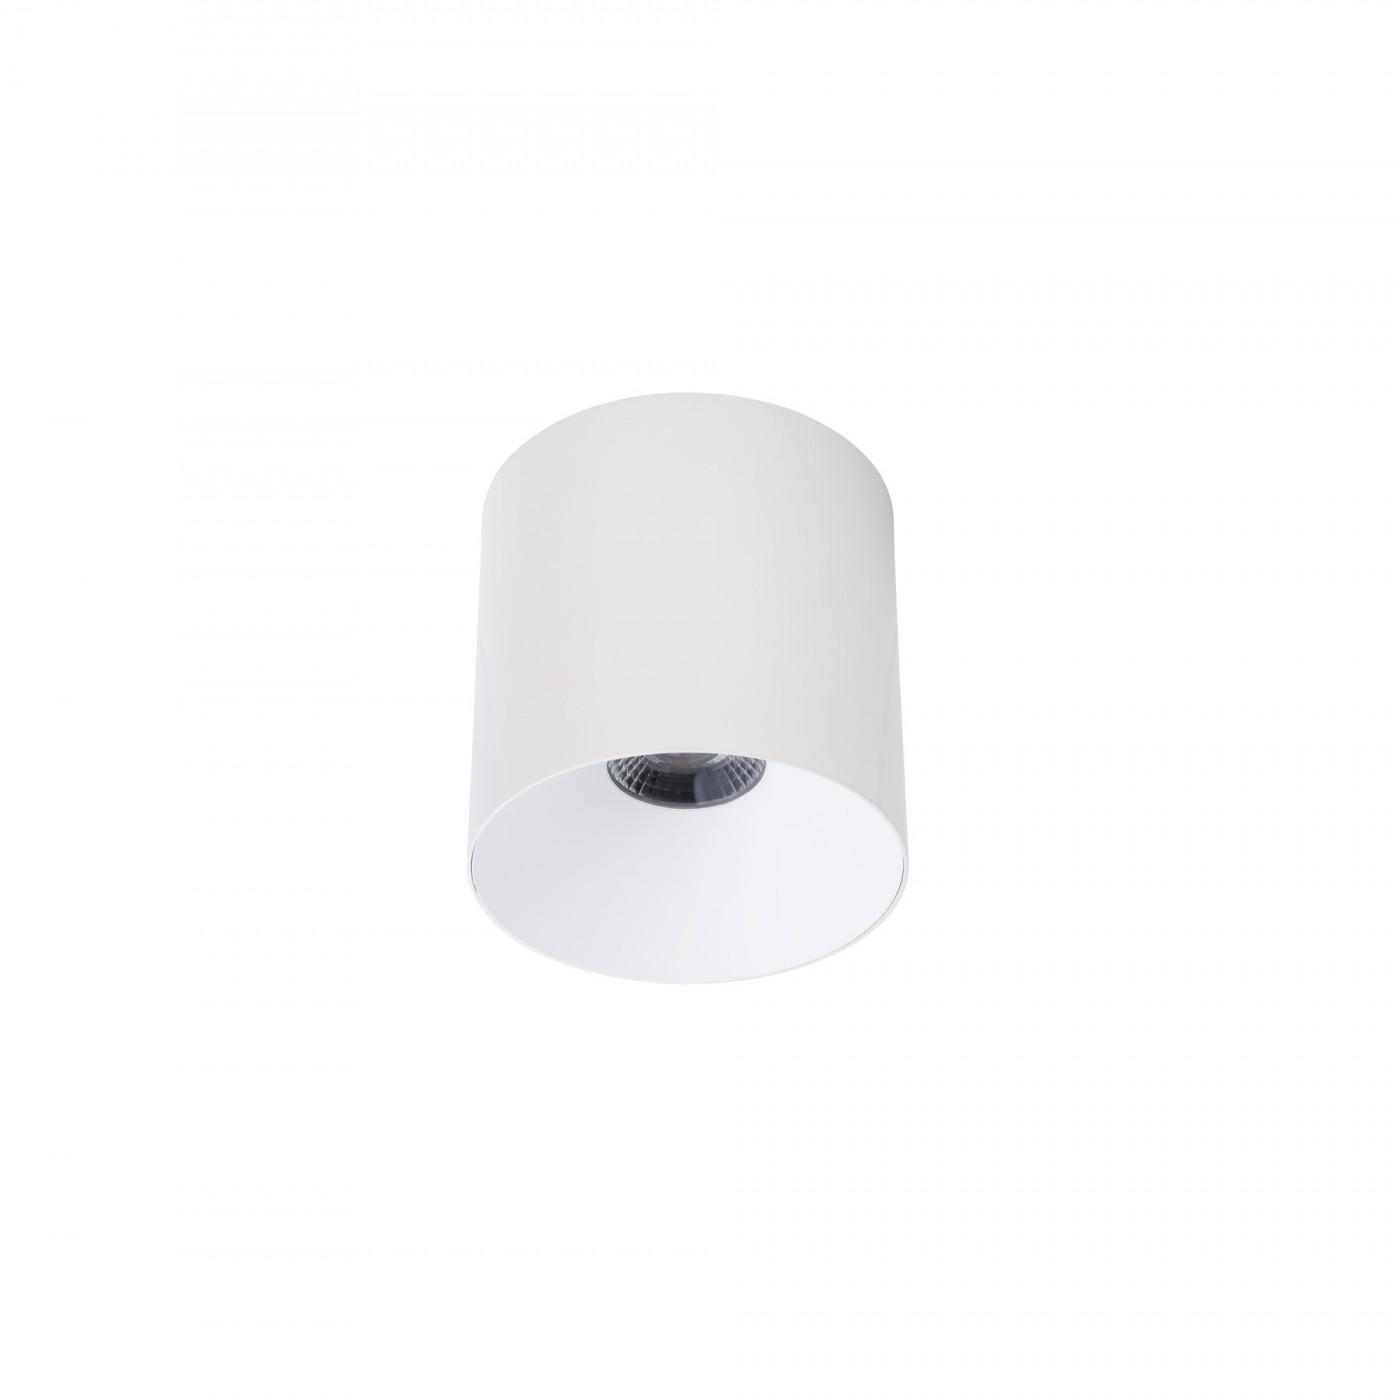 CL IOS LED 20W 4000K white 8743 Nowodvorski Lighting